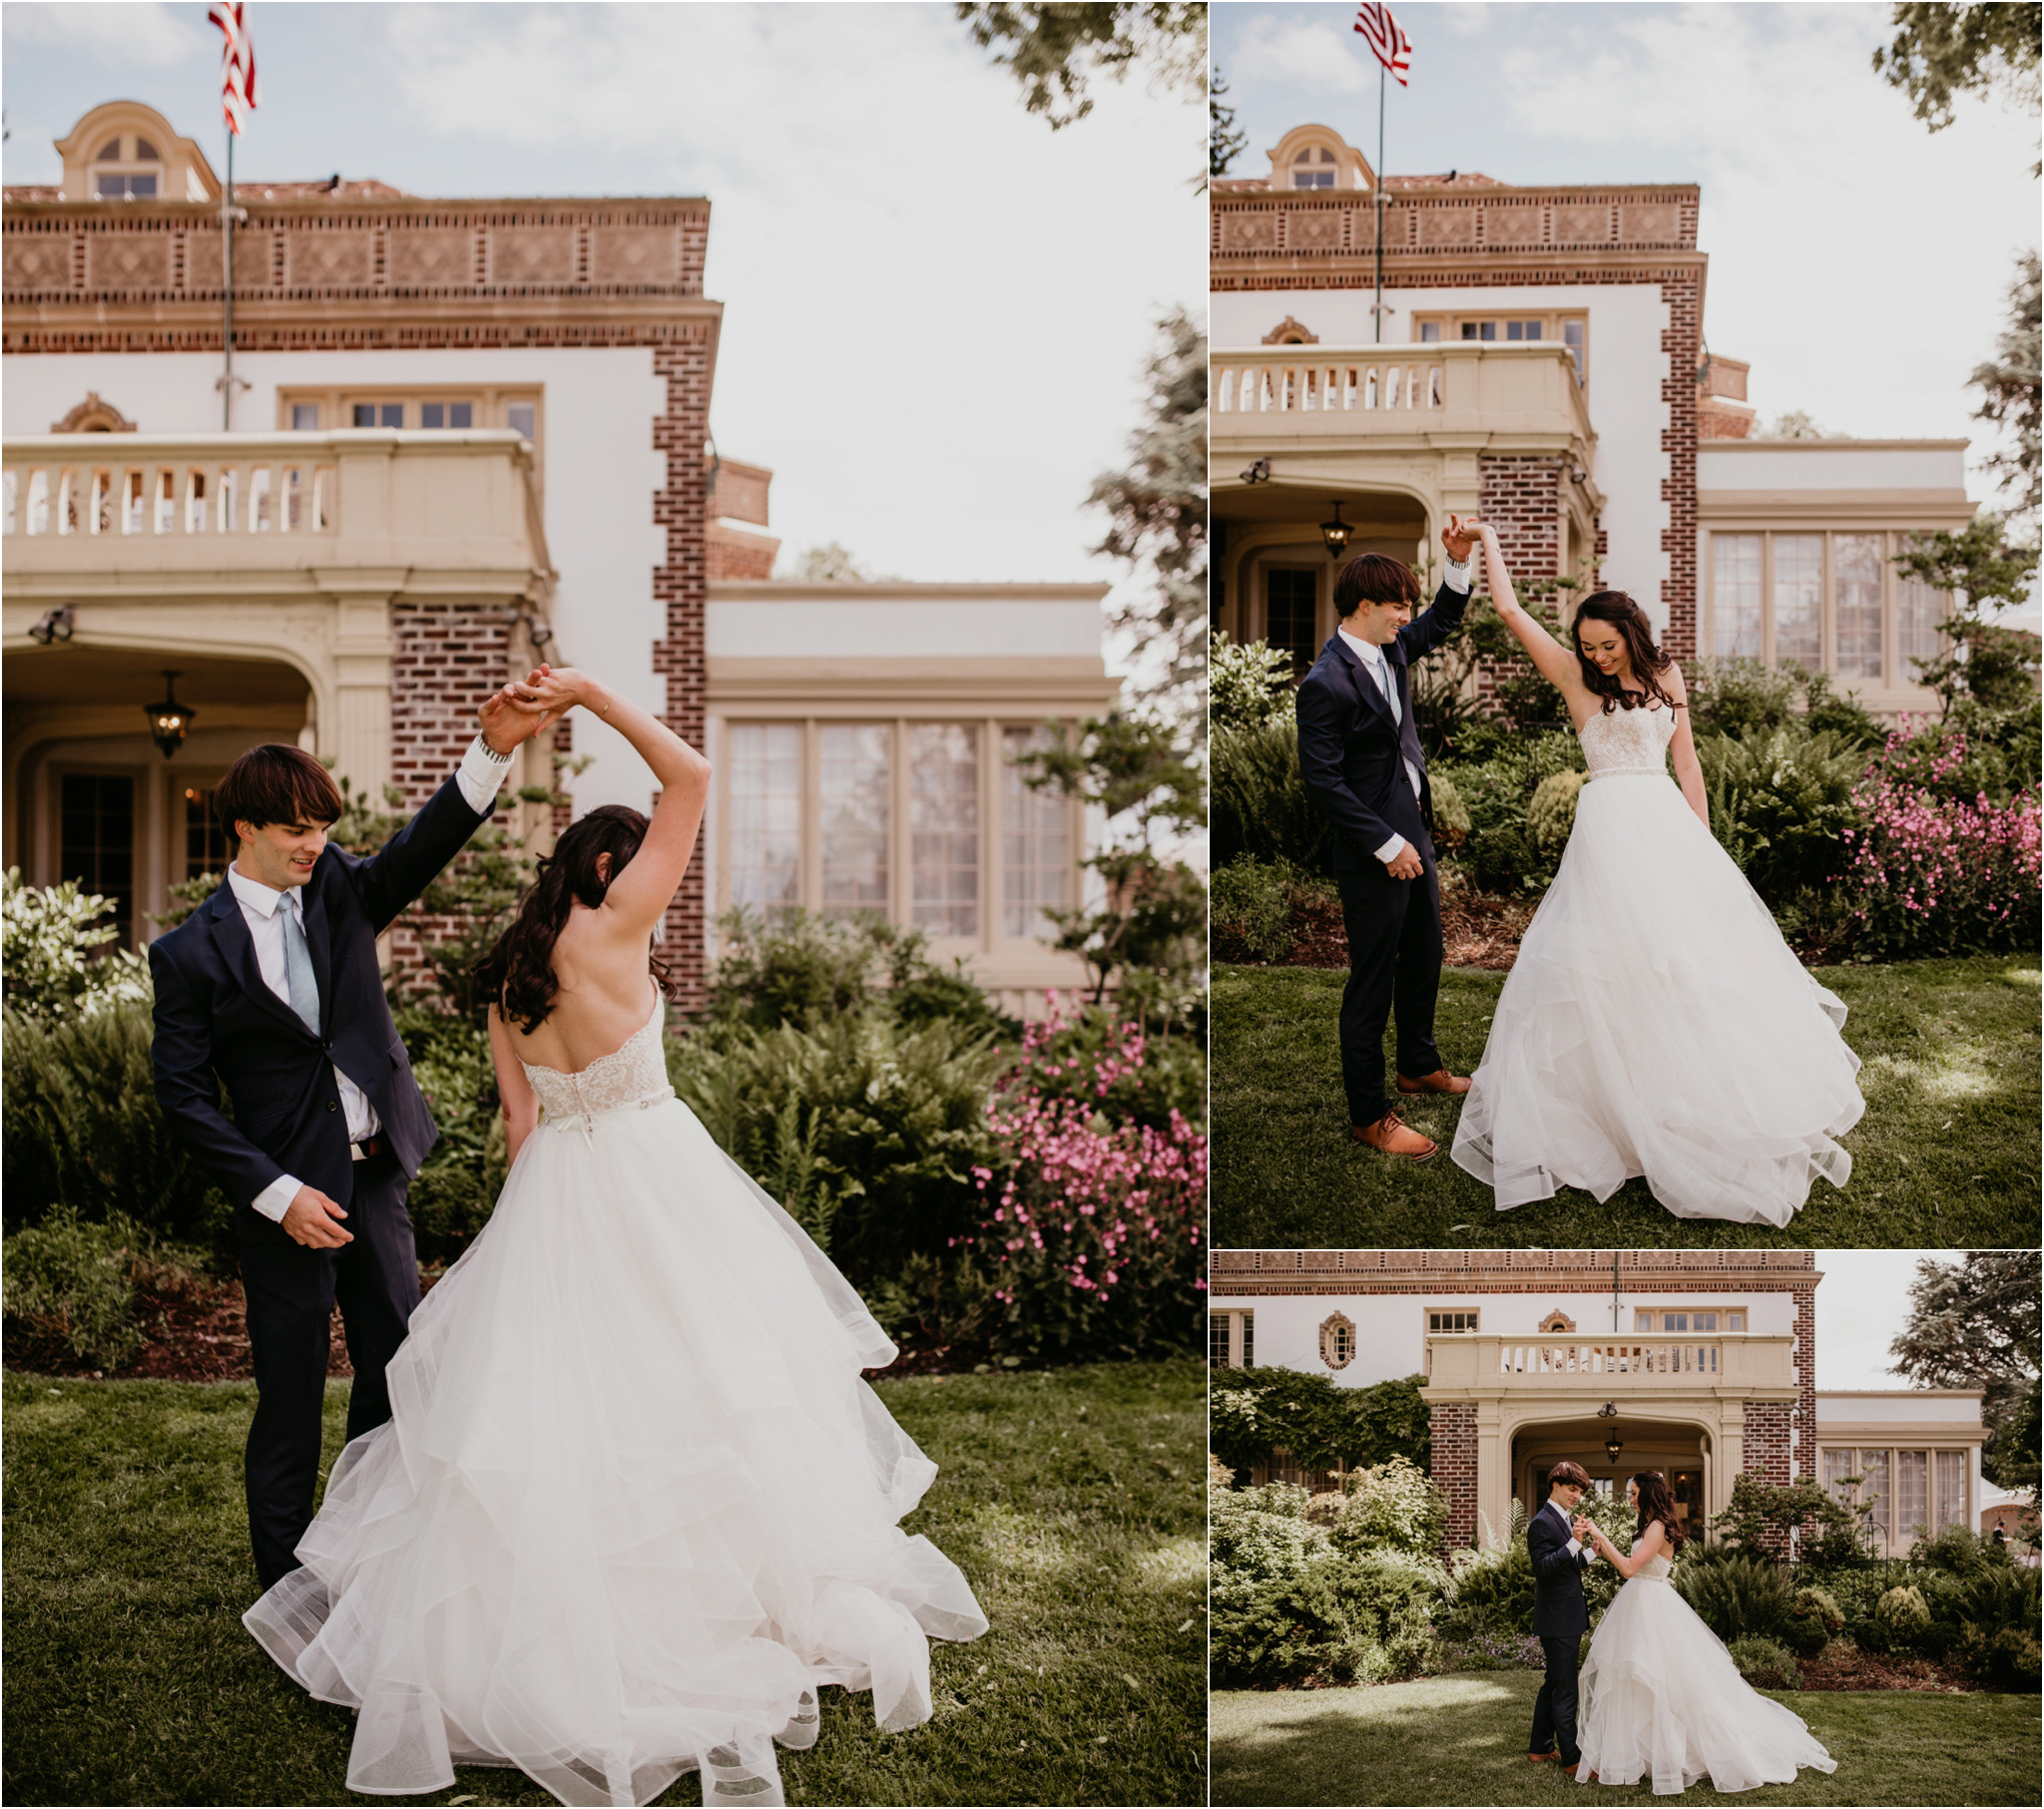 chance-and-ondrea-lairmont-manor-wedding-seattle-photographer-033.jpg